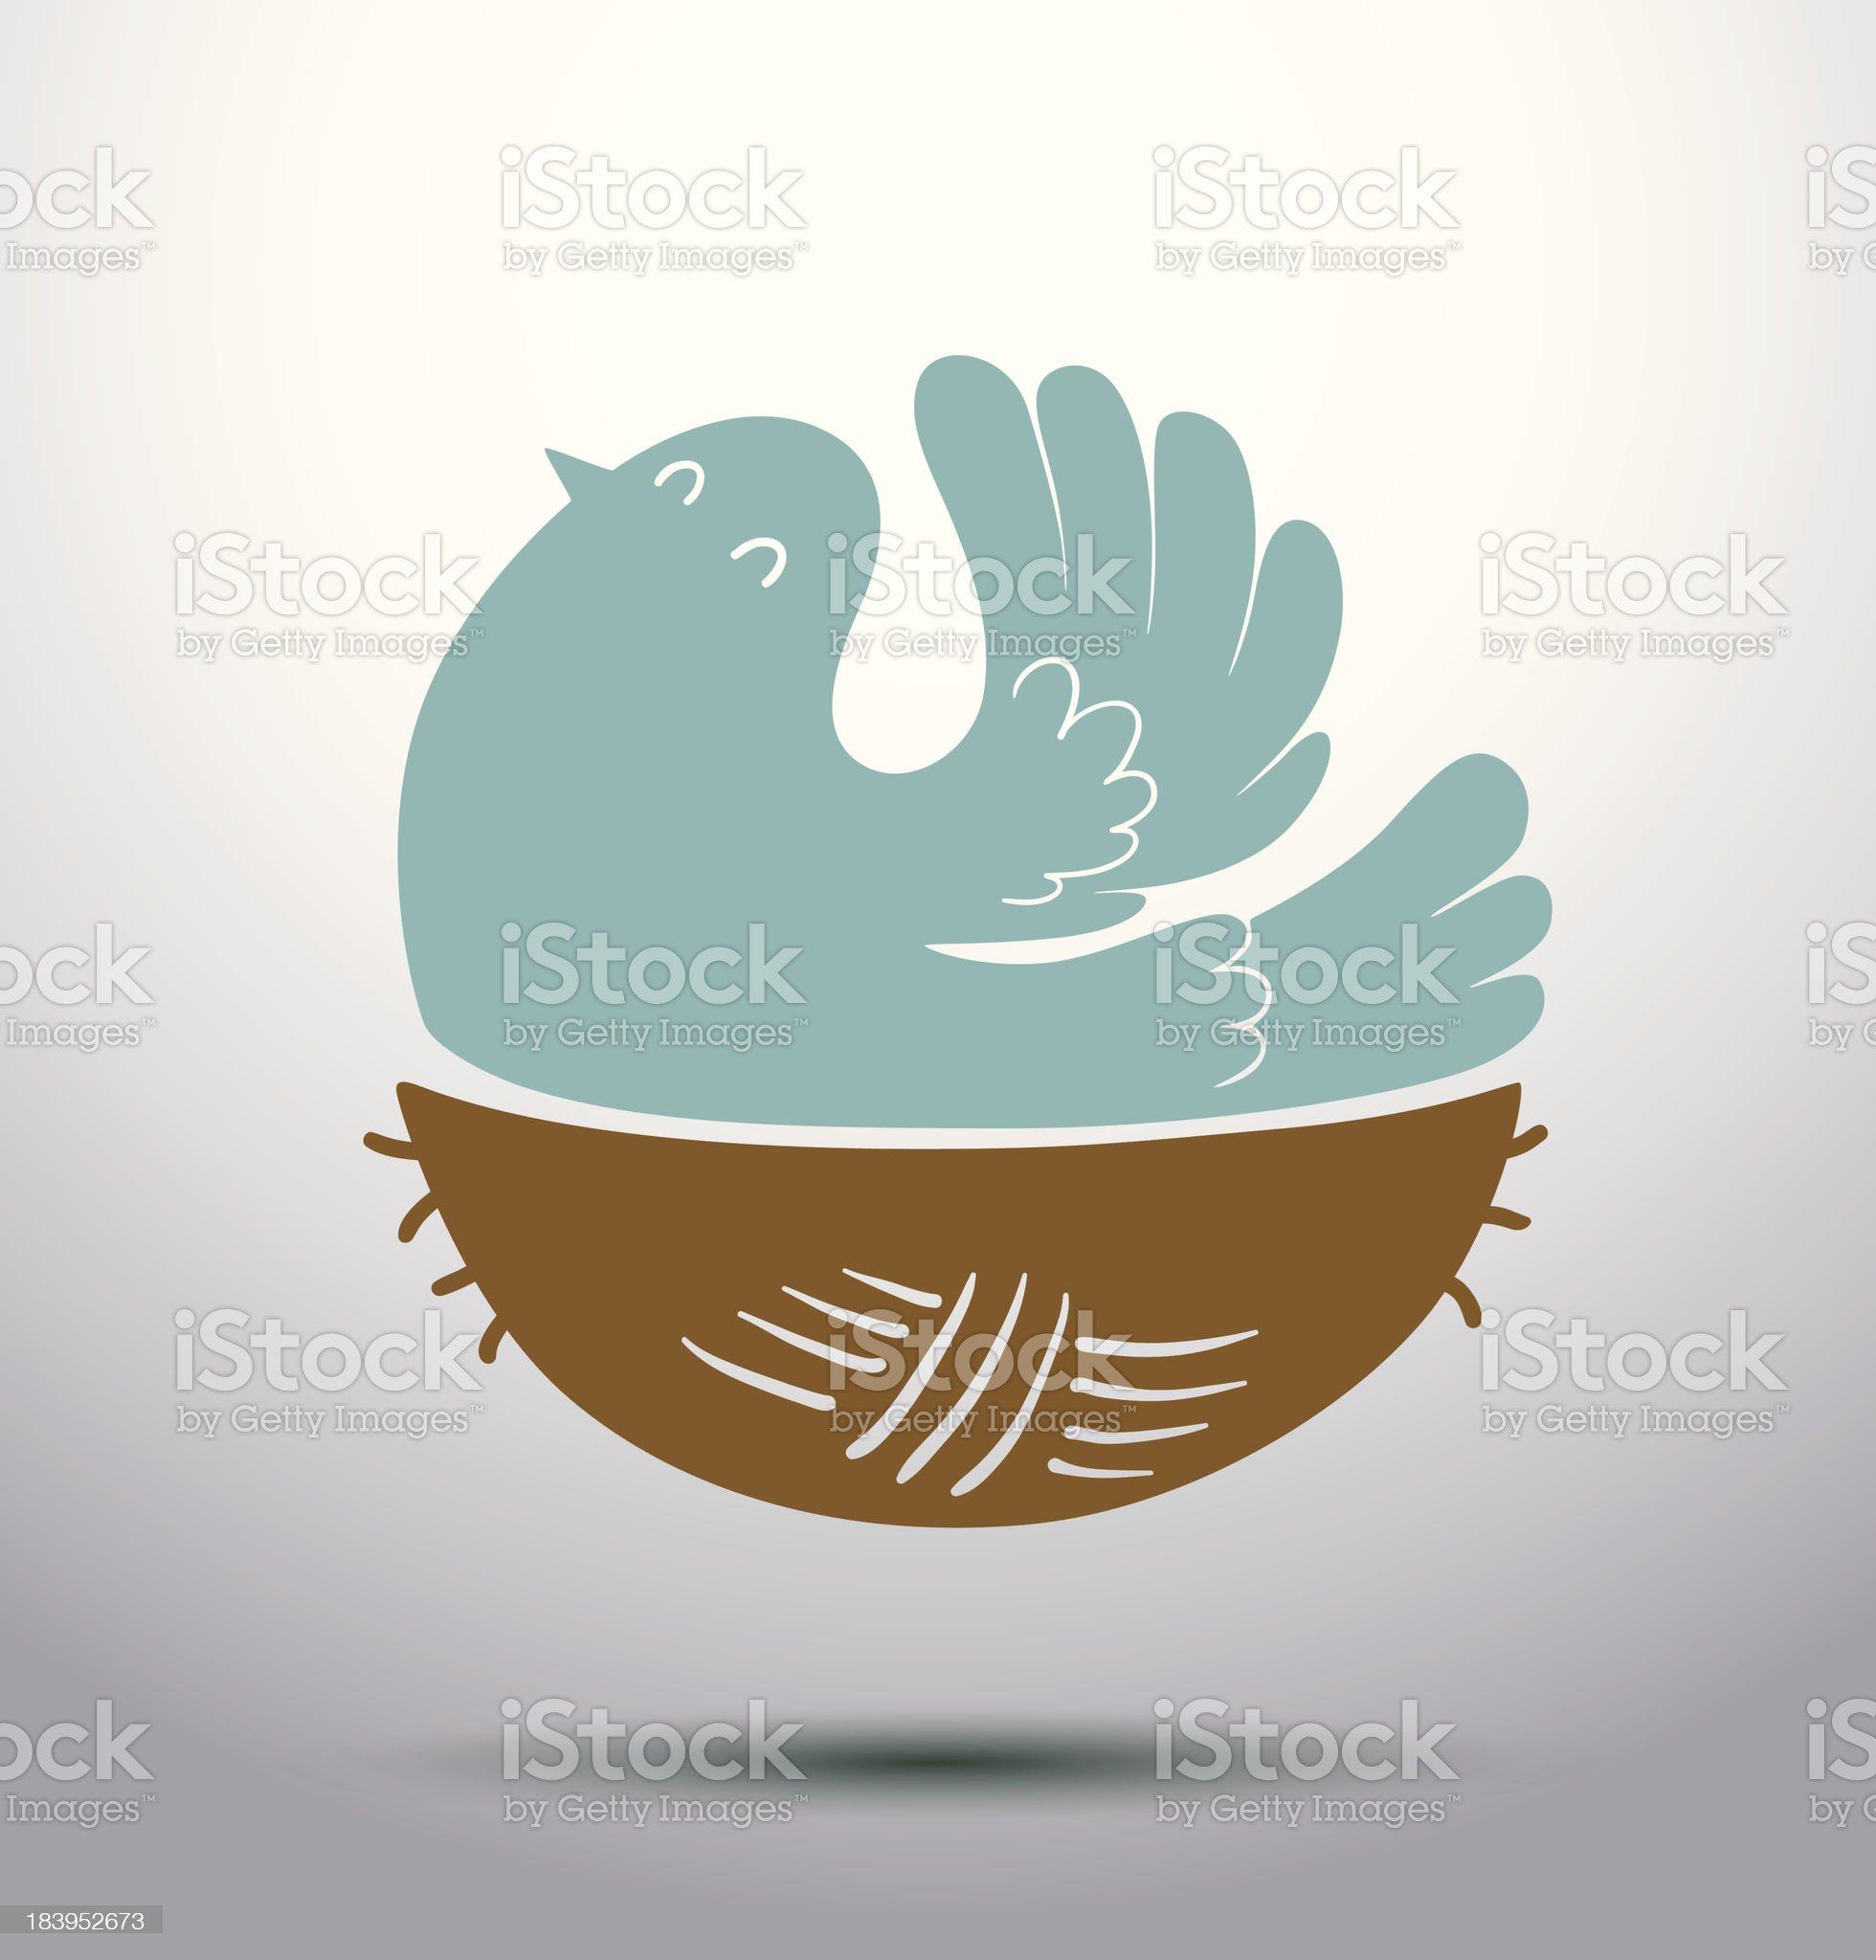 Blue bird in the nest royalty-free stock vector art